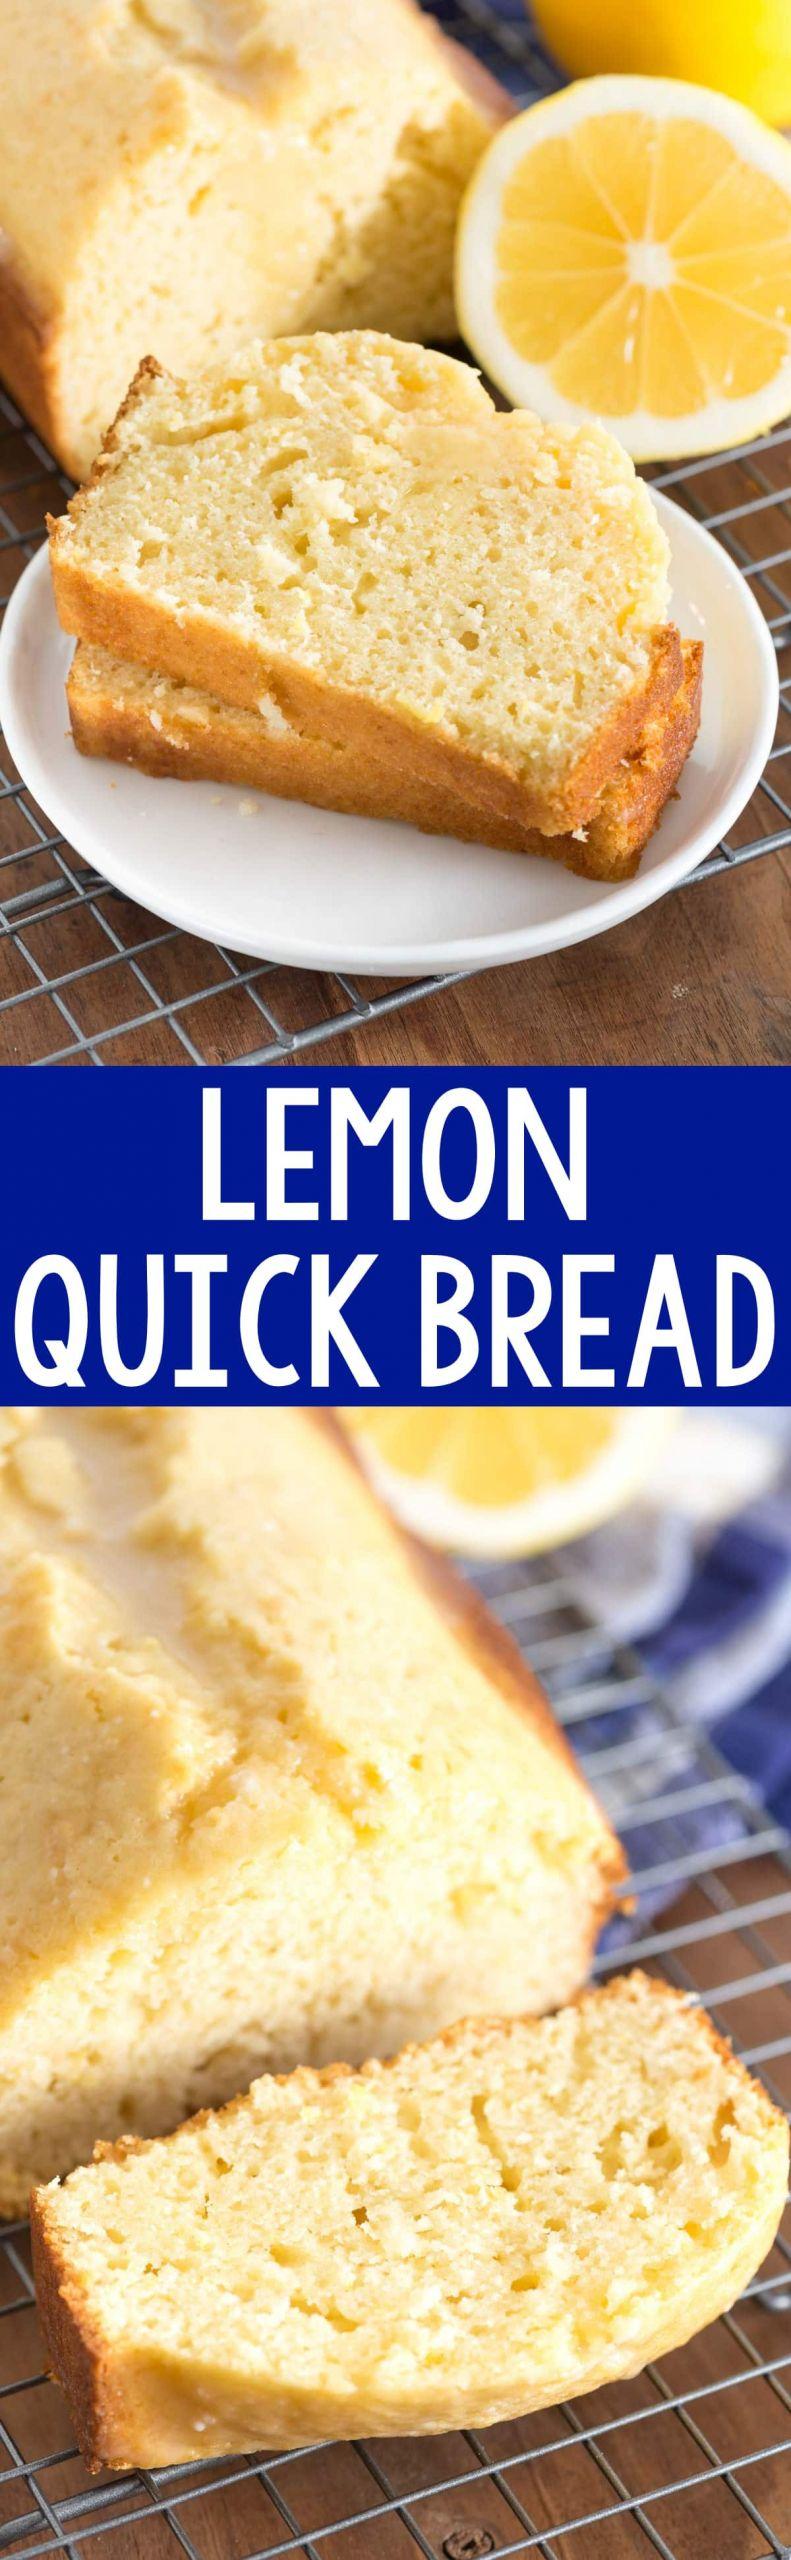 Quick Easy Bread Recipe  Lemon Quick Bread Crazy for Crust